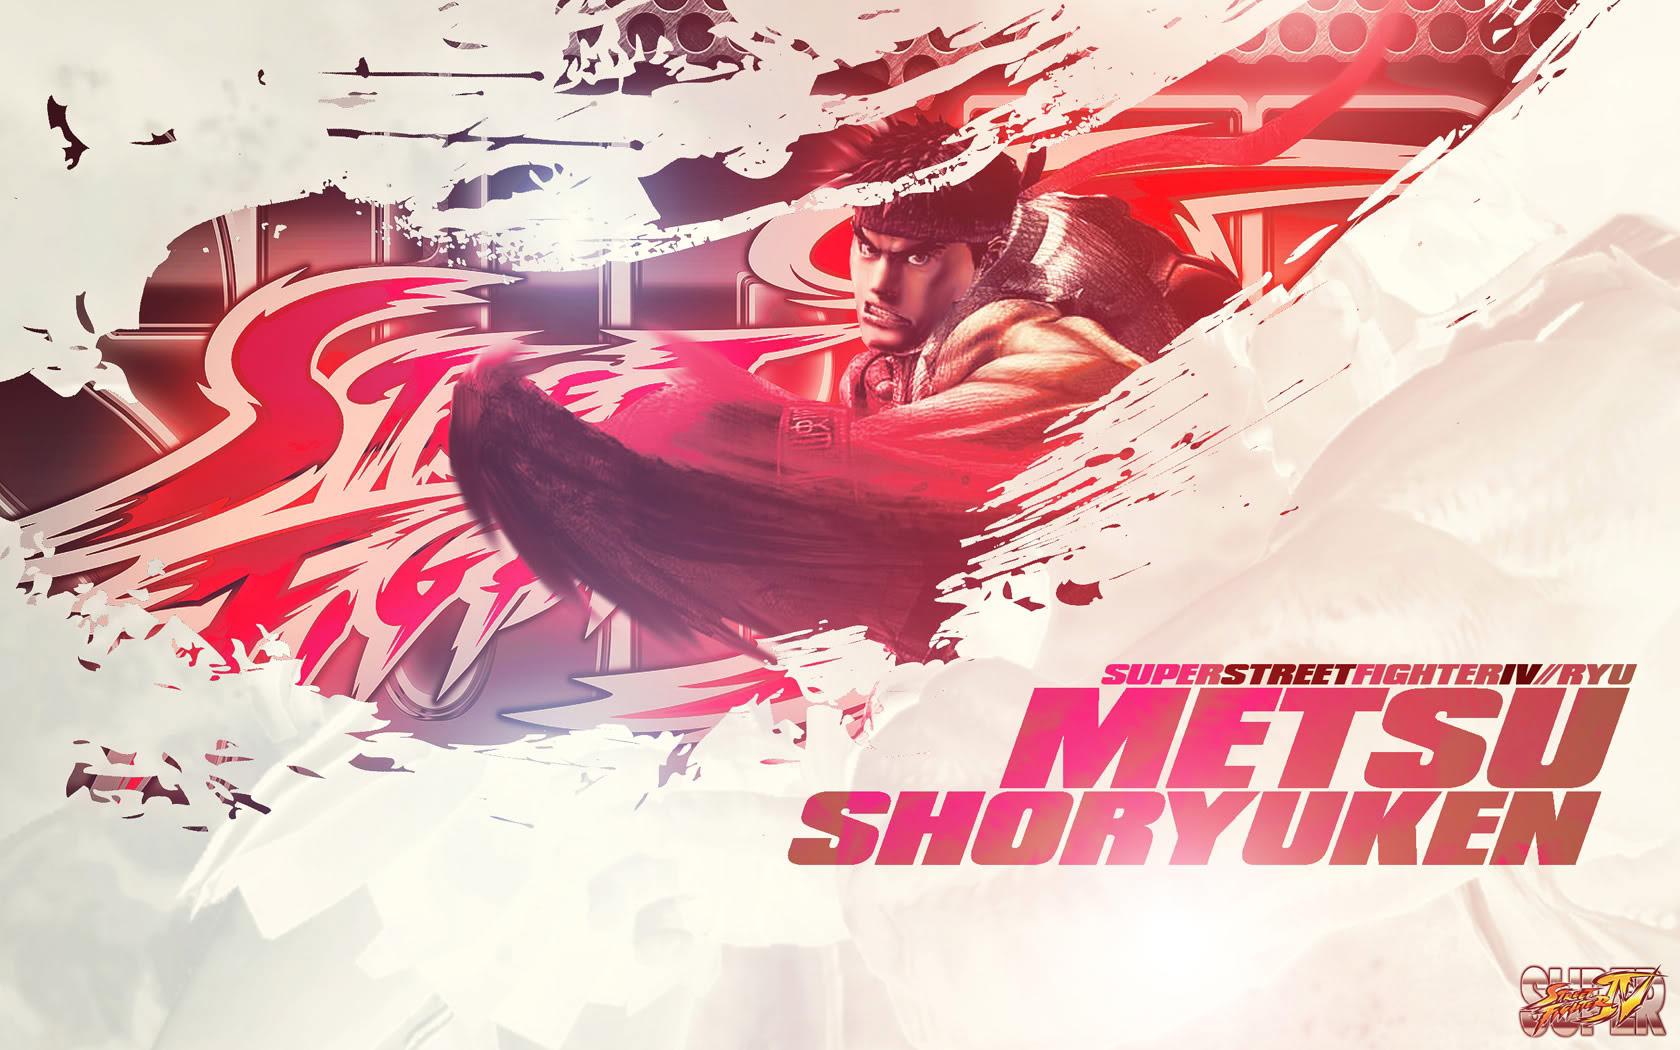 Ryu Super Street Fighter 4 wallpaper by BossLogic